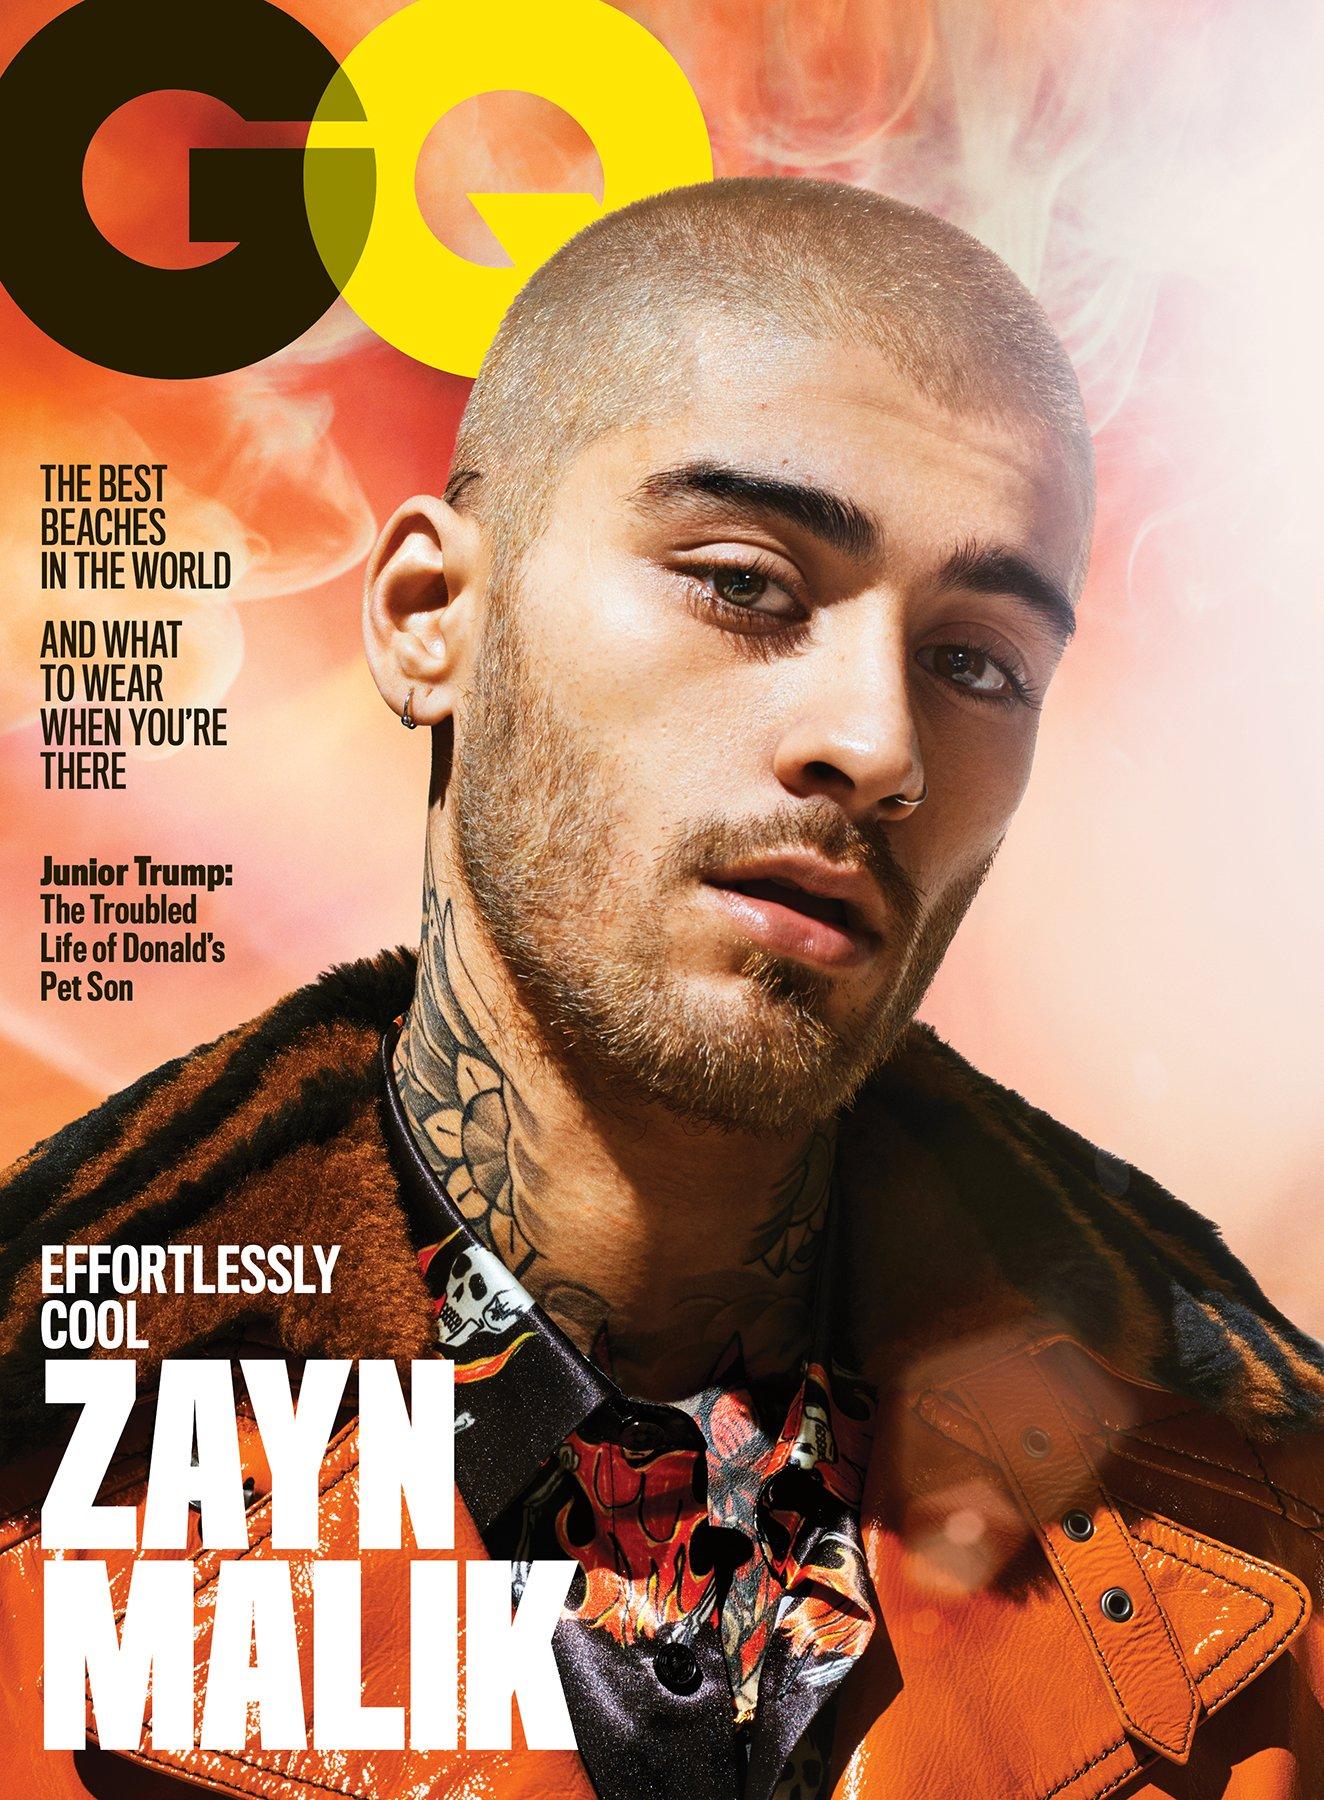 .@ZaynMalik covers GQ's July 2018 issue. Photographed by Sebastian Mader, story by @CBattan. https://t.co/py51CyXokj https://t.co/VAogRbnxa3